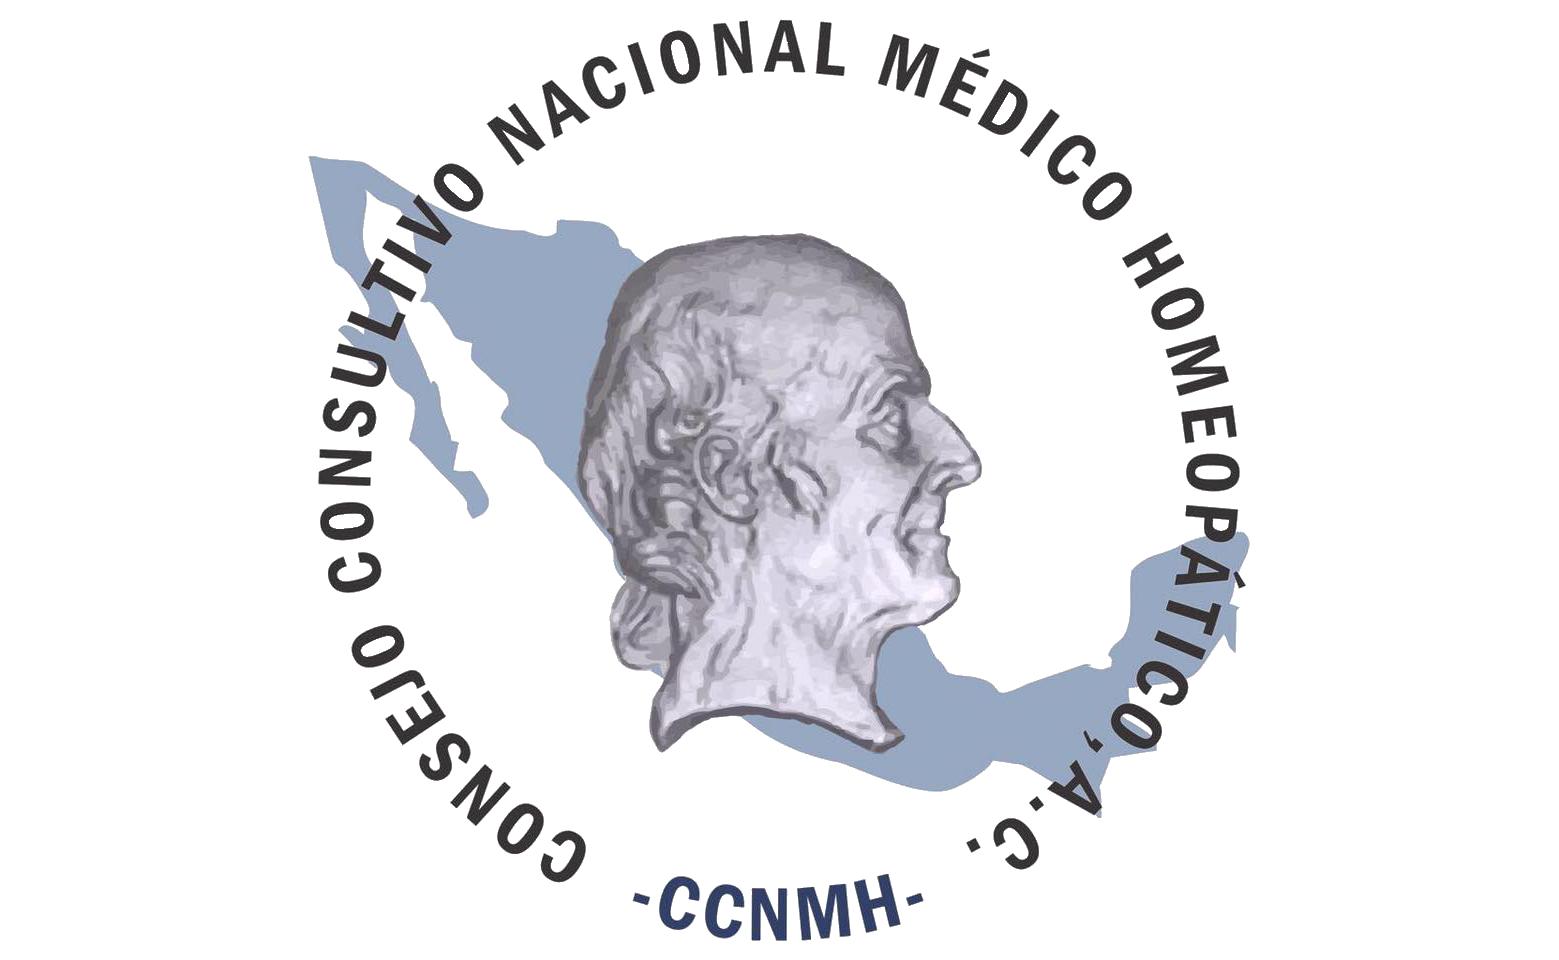 CCNMH logoal